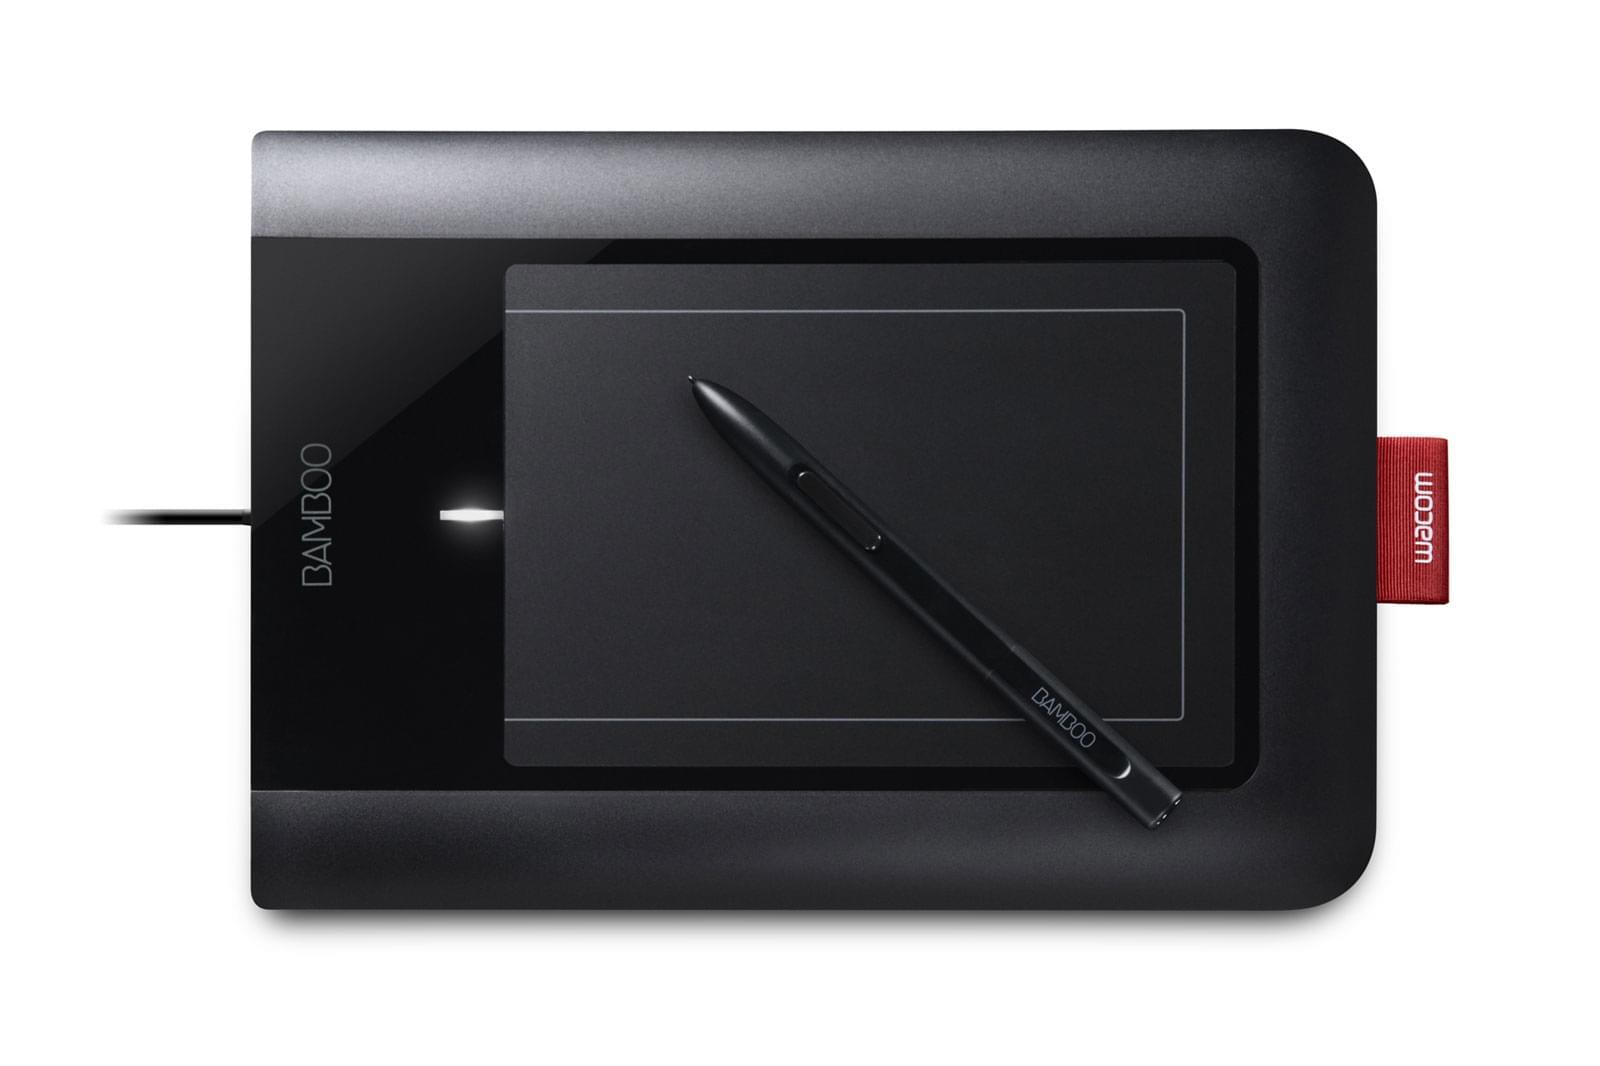 Wacom Bamboo Pen - Tablette graphique Wacom - Cybertek.fr - 0